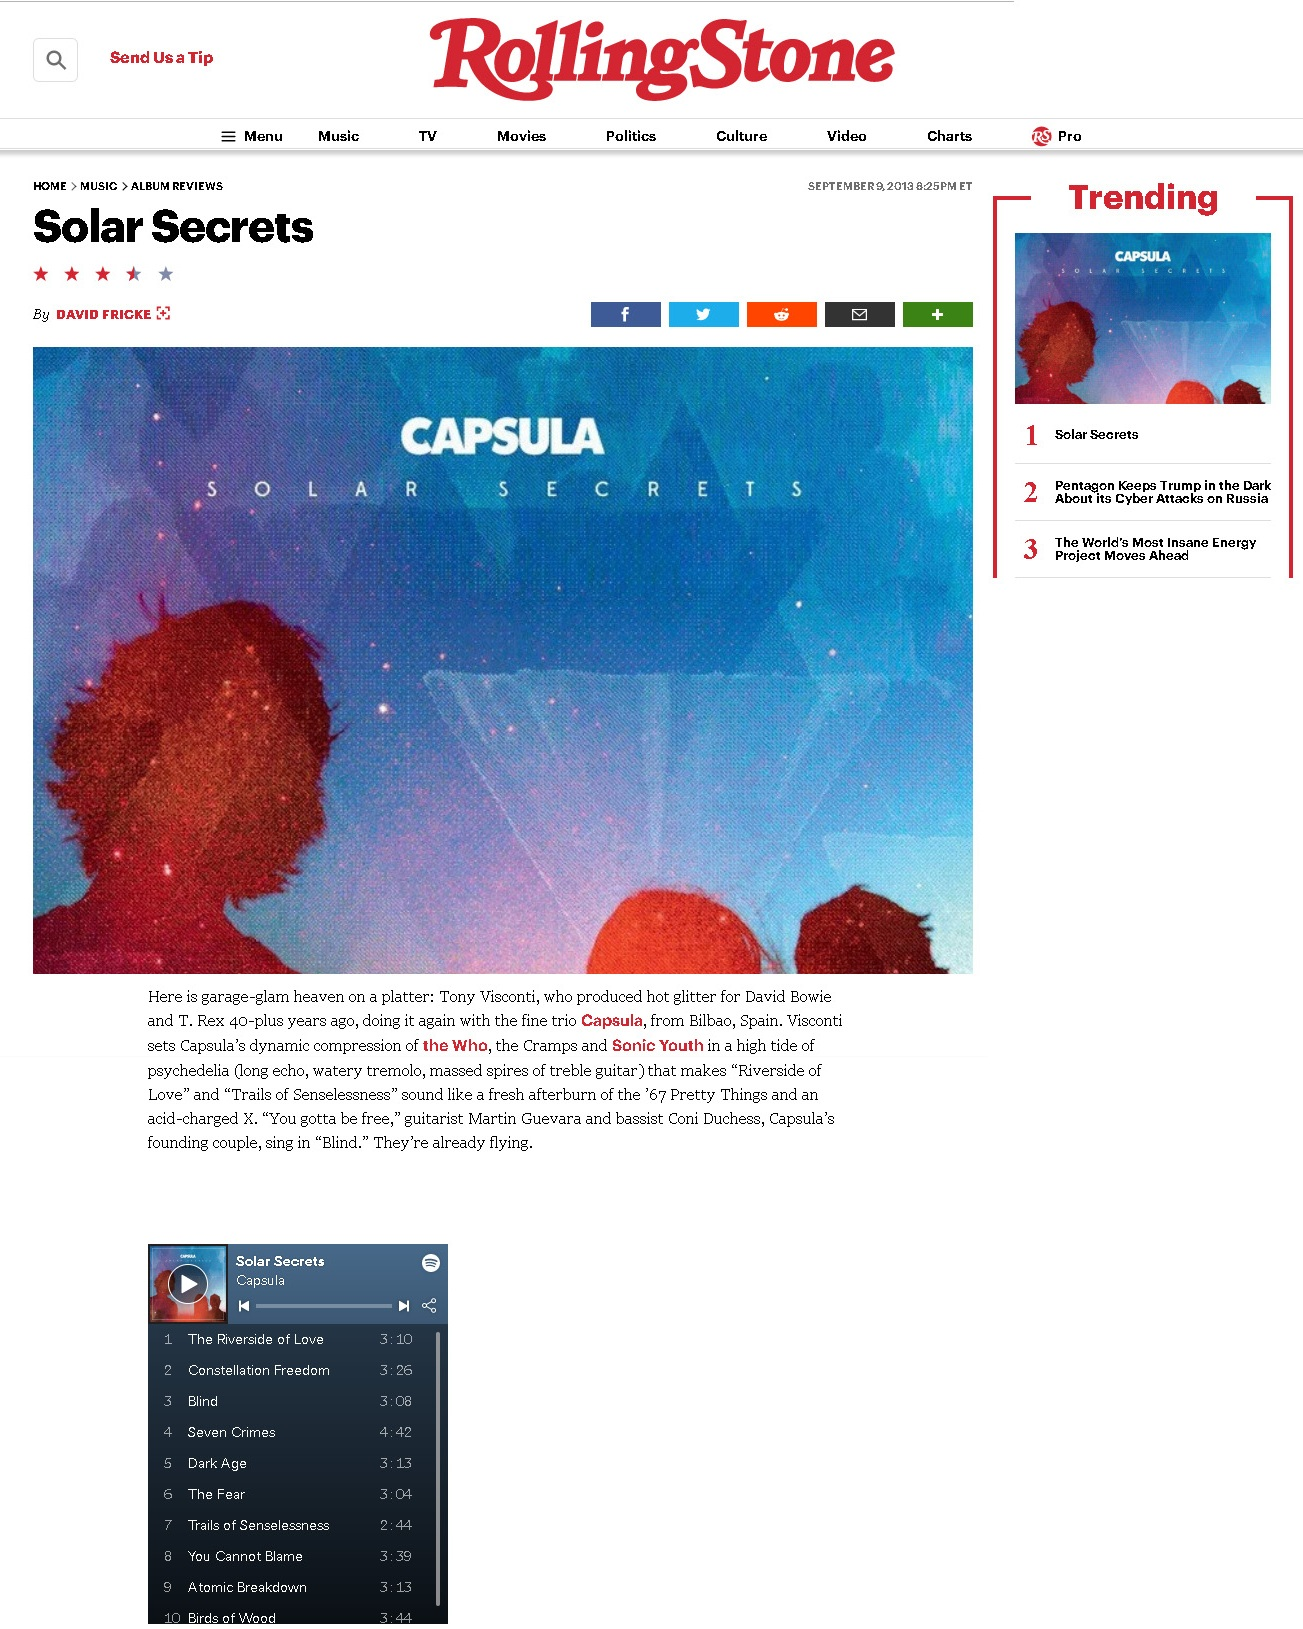 Capsula+Rolling+Stone+David+Fricke+Solar+Secrets+Tony+Visconti.jpg